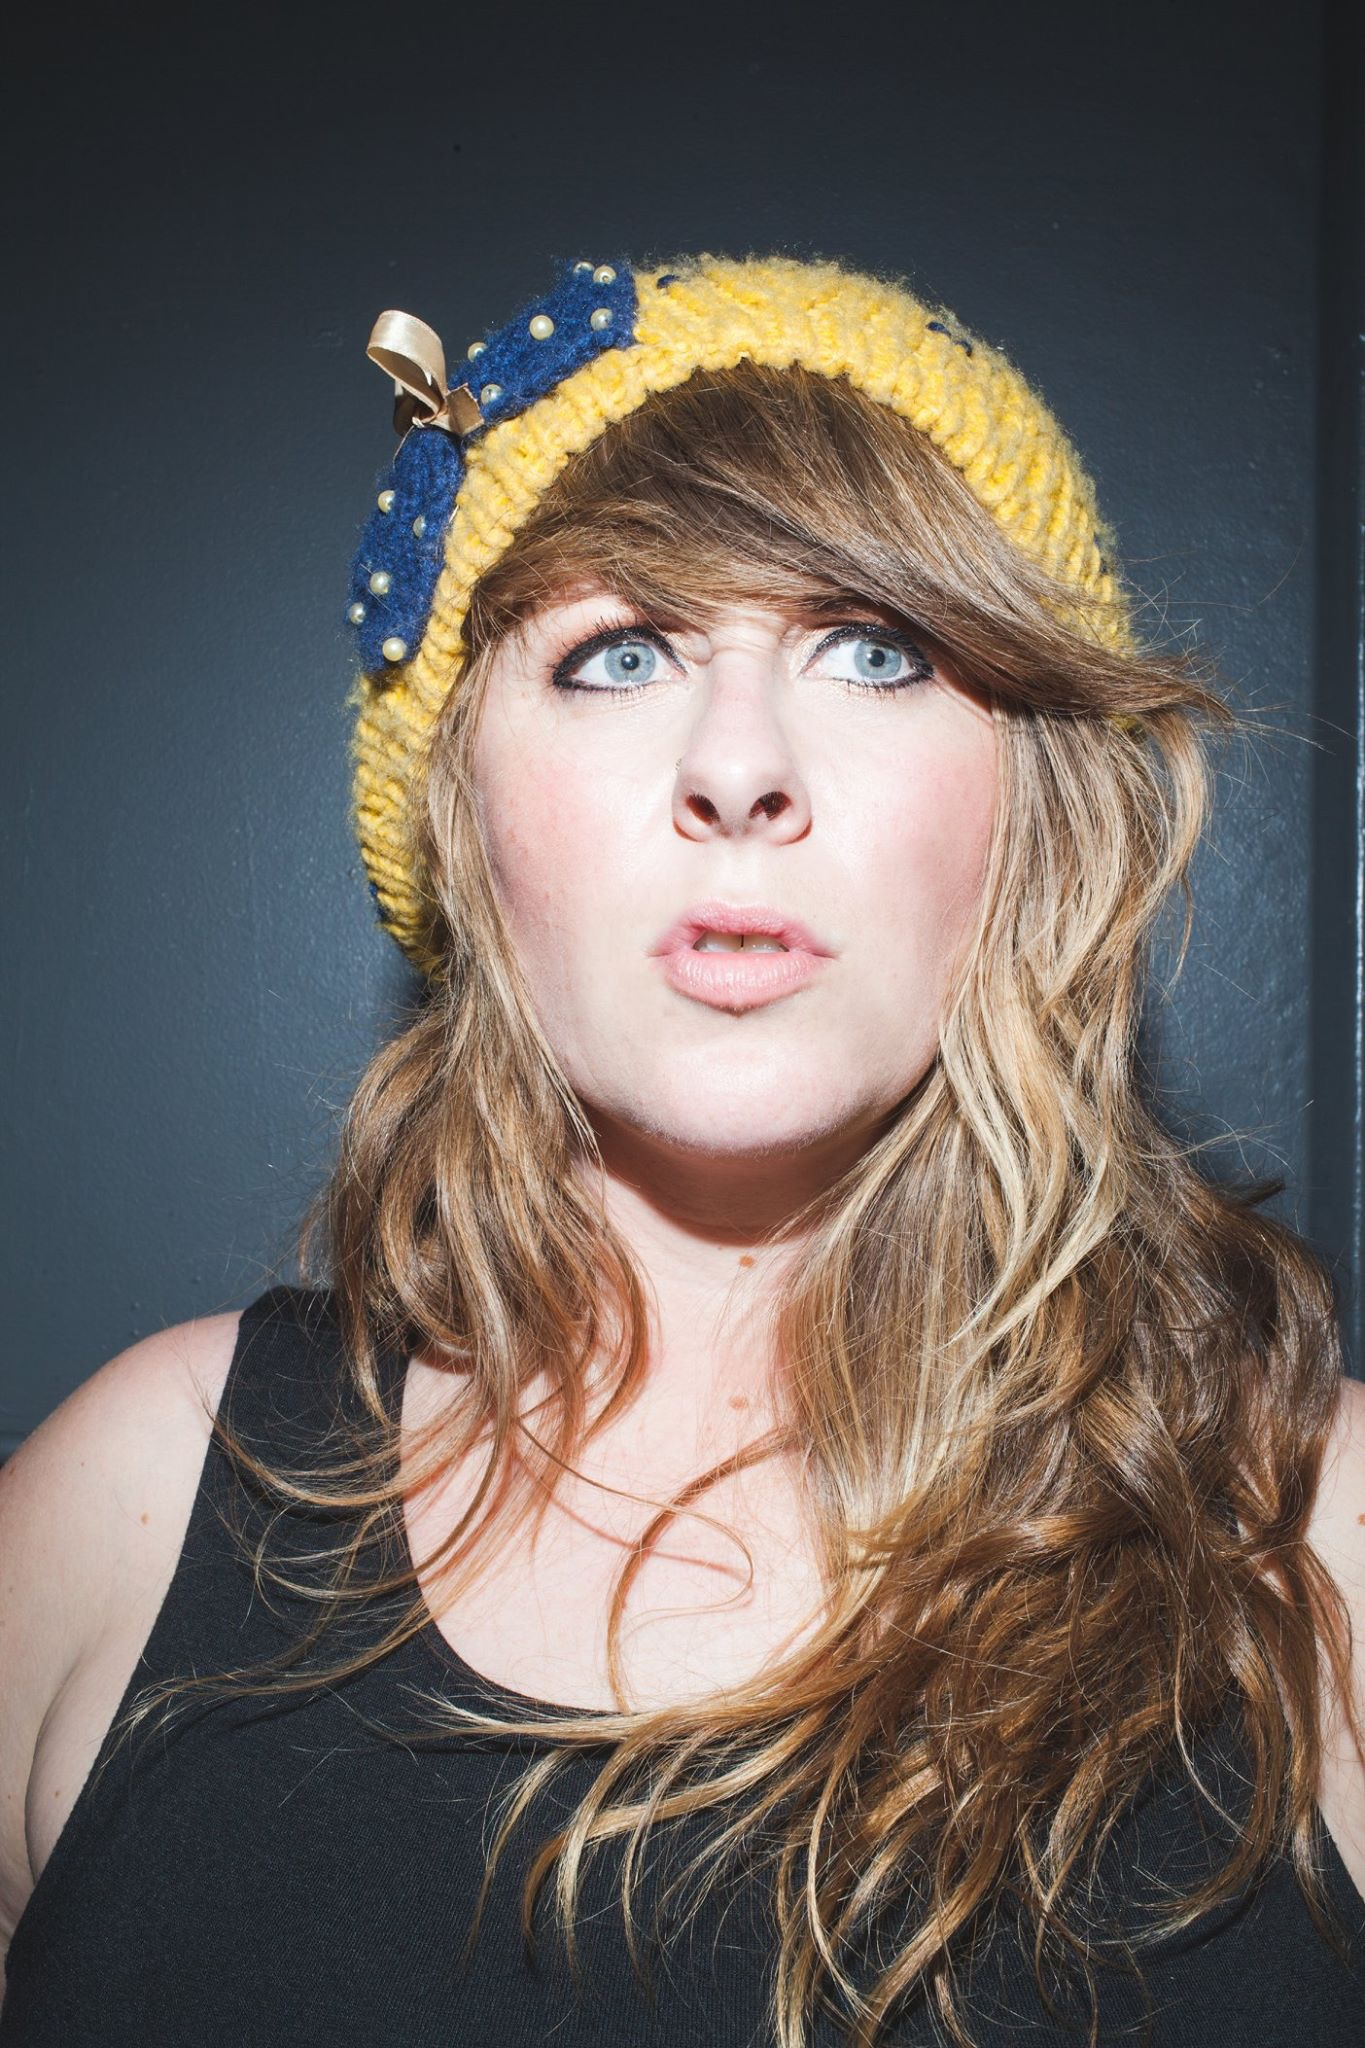 Tori Headshot - Original